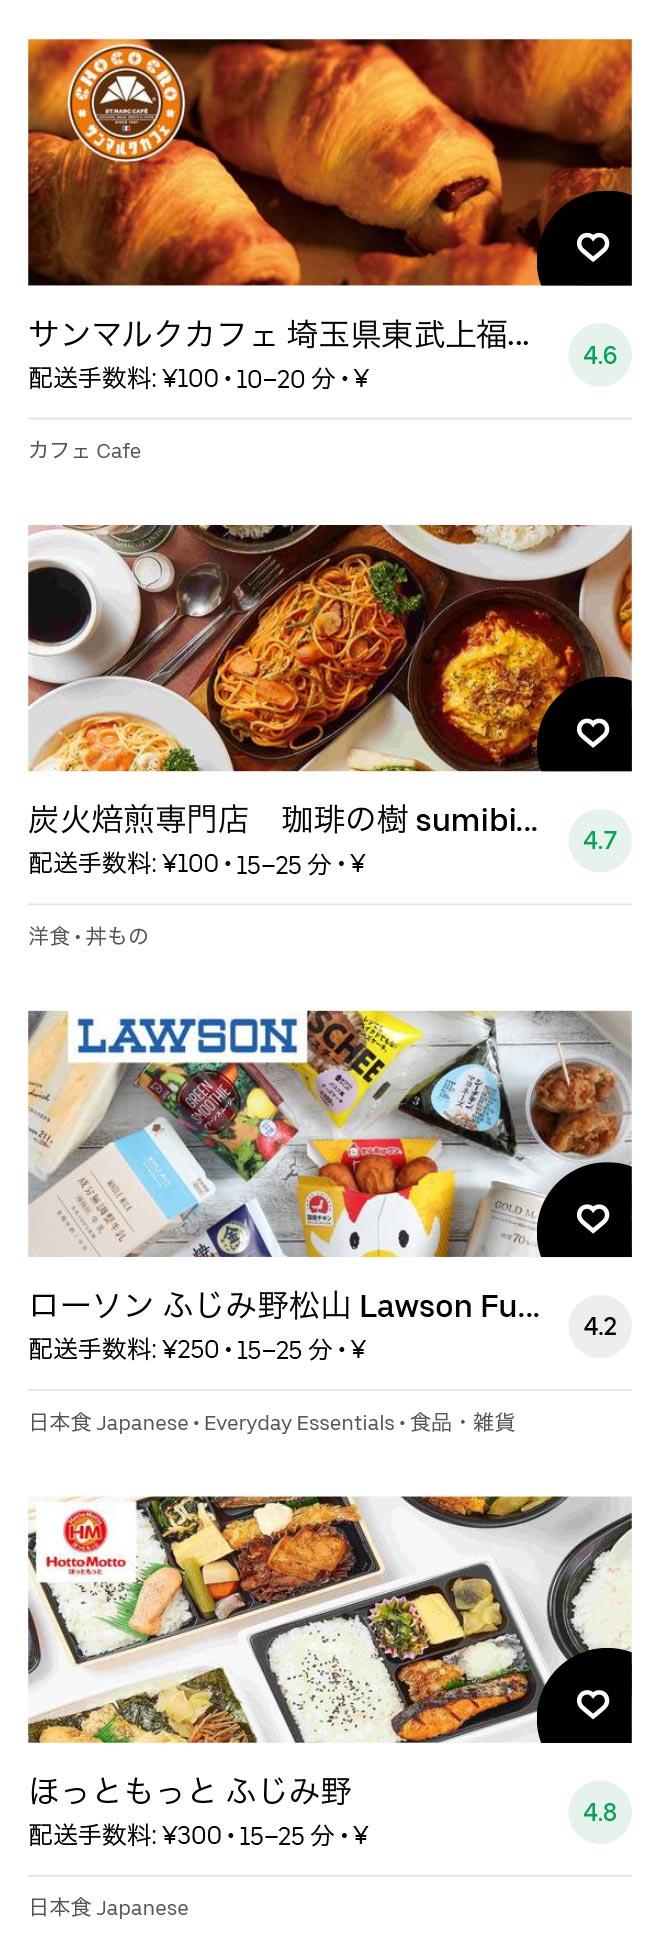 Kamifukuoka menu 2011 05